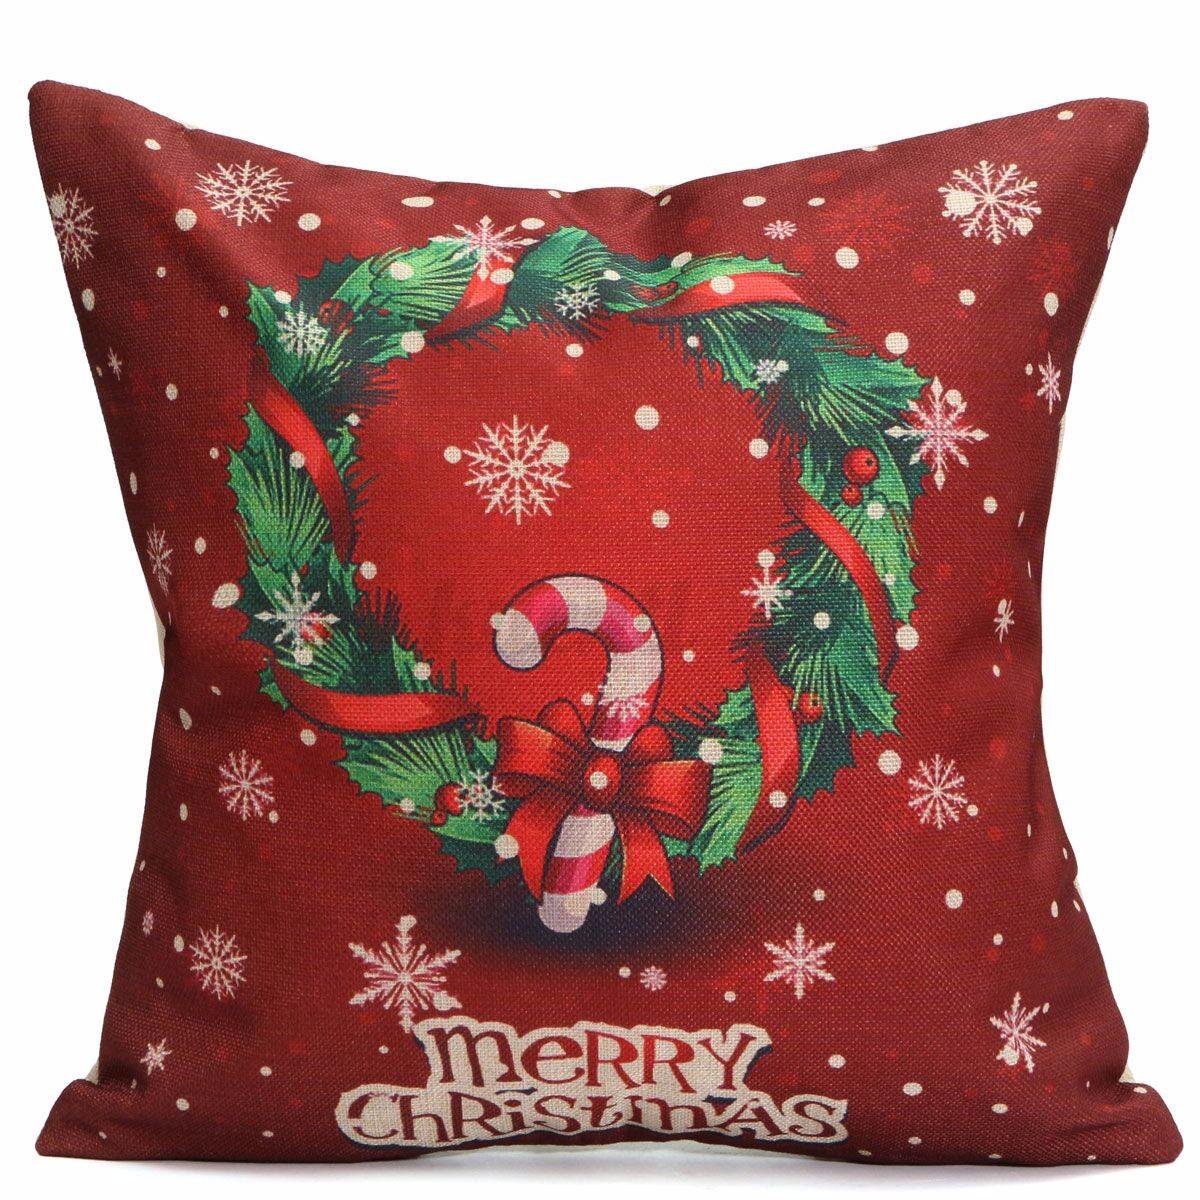 Baumwolle leinen kissenbezug kissenh lle sofa dekokissen - Dekokissen weihnachten ...